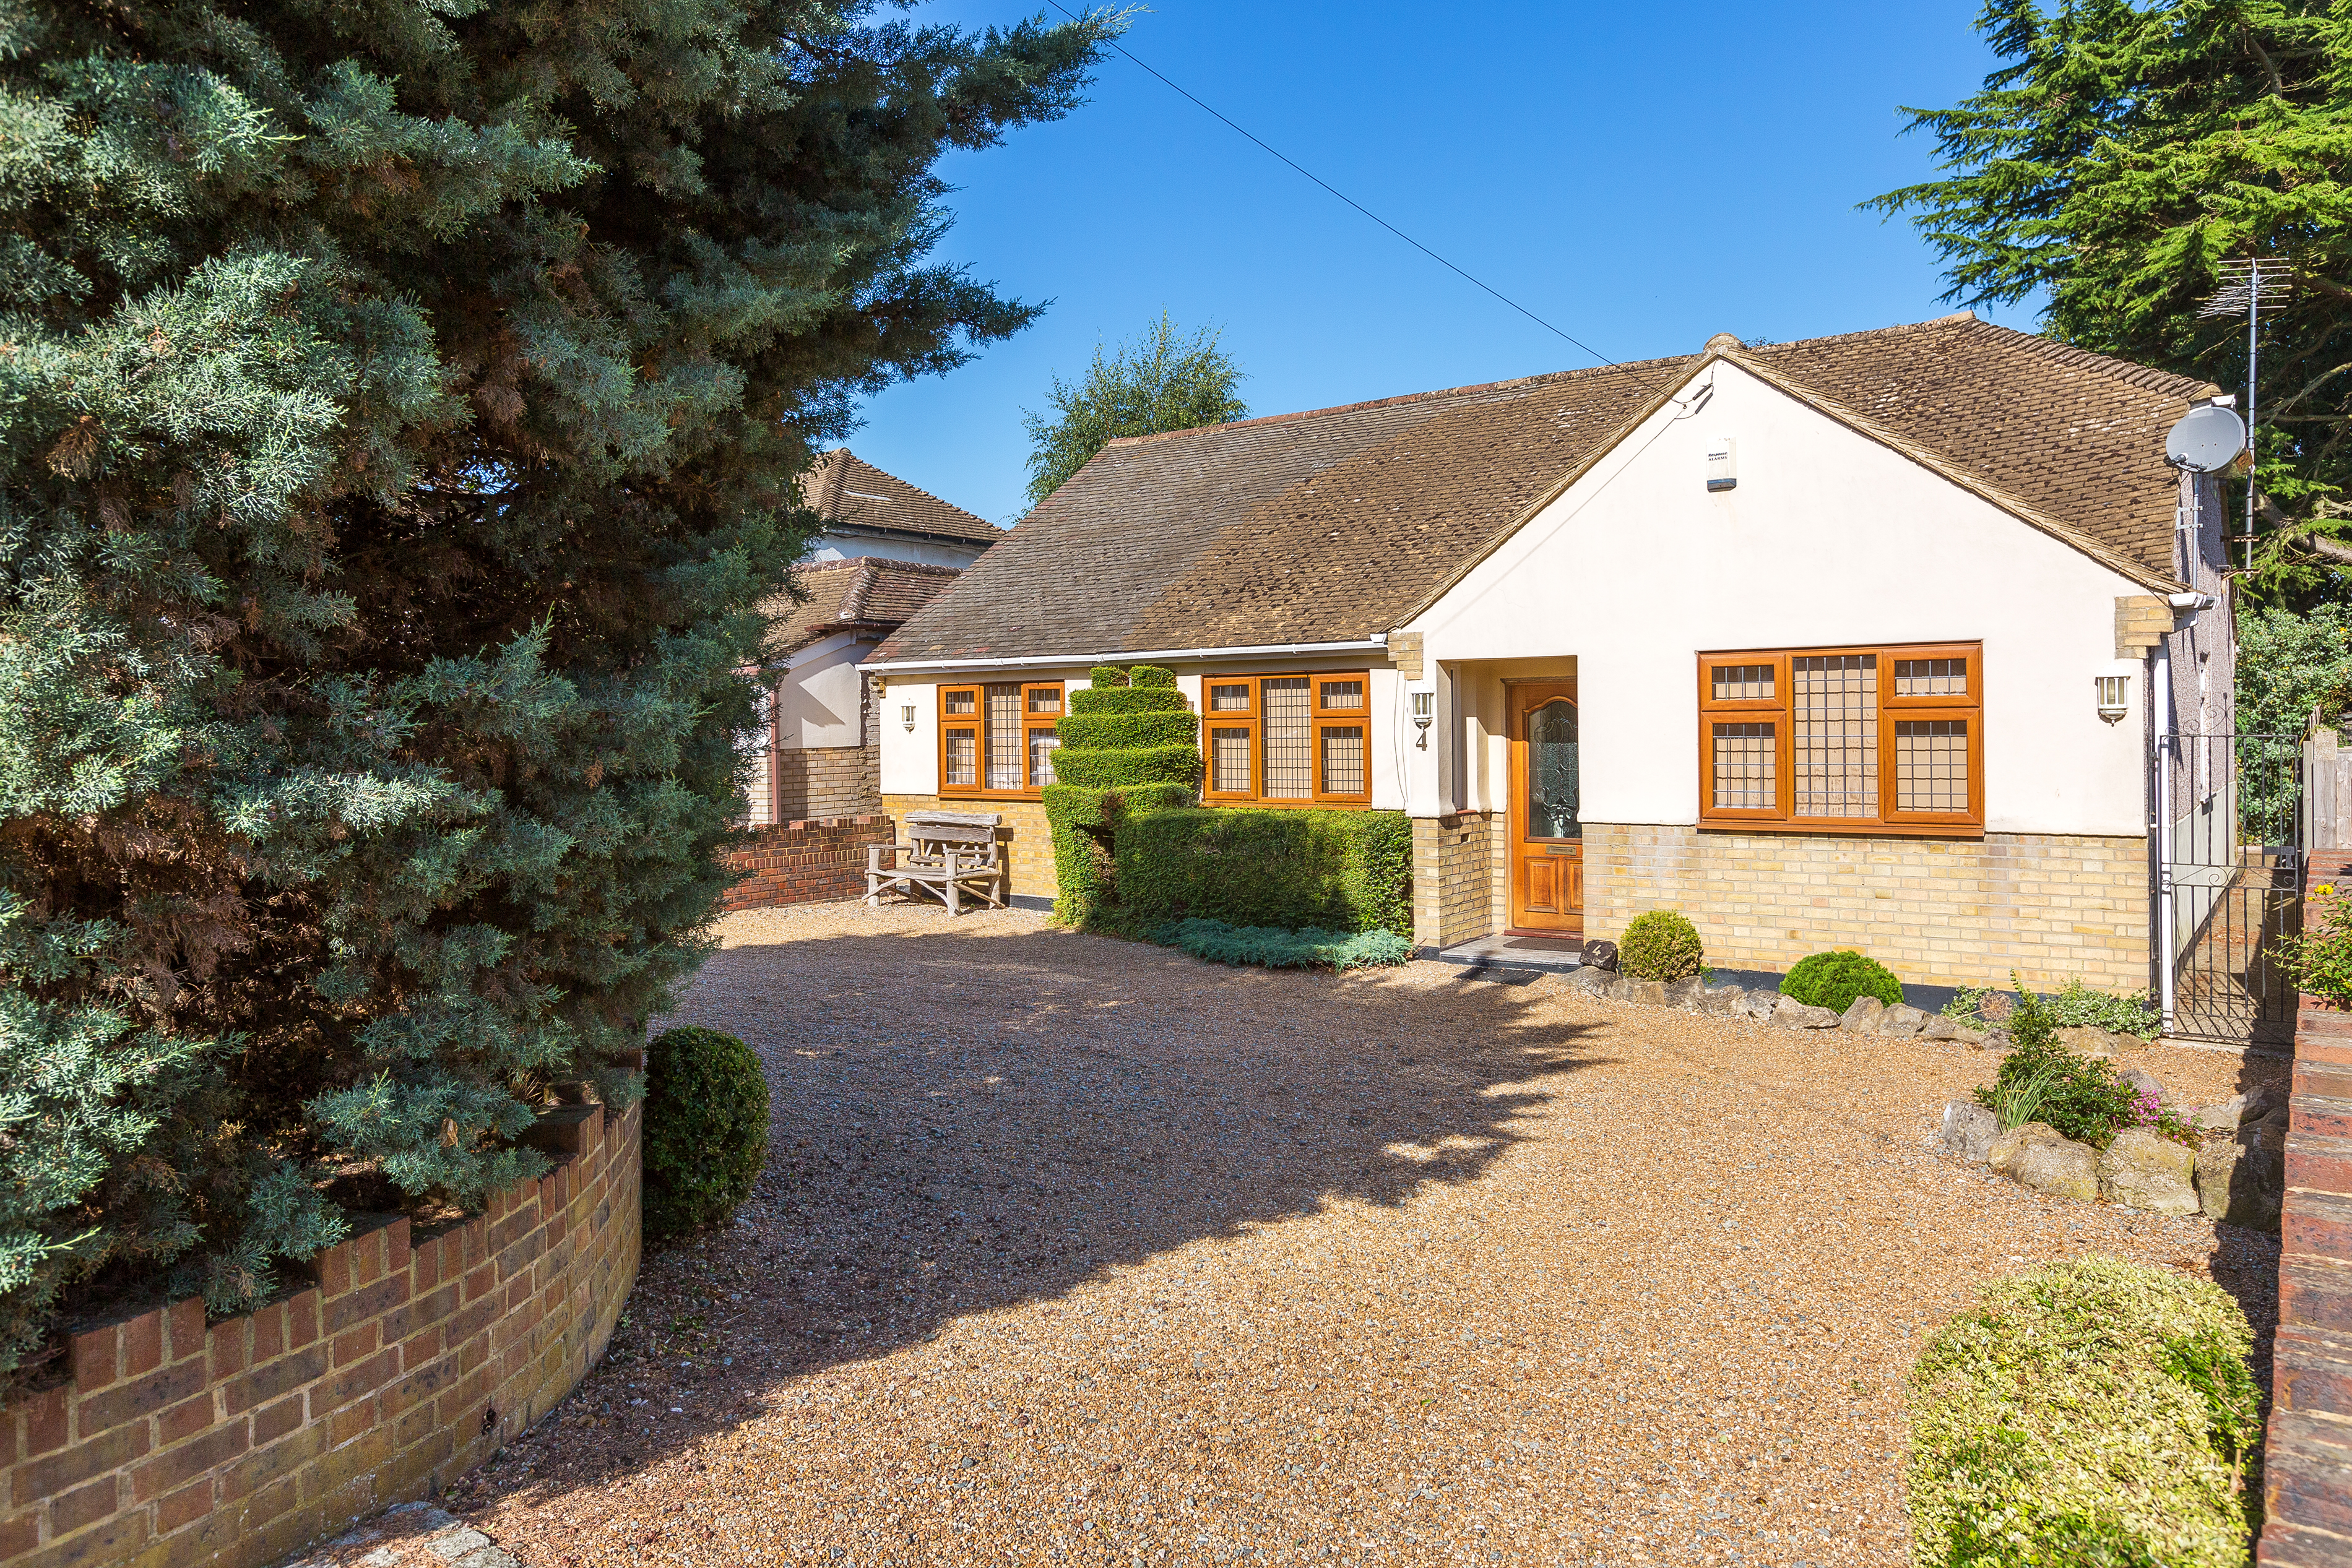 New Barn - £575,000